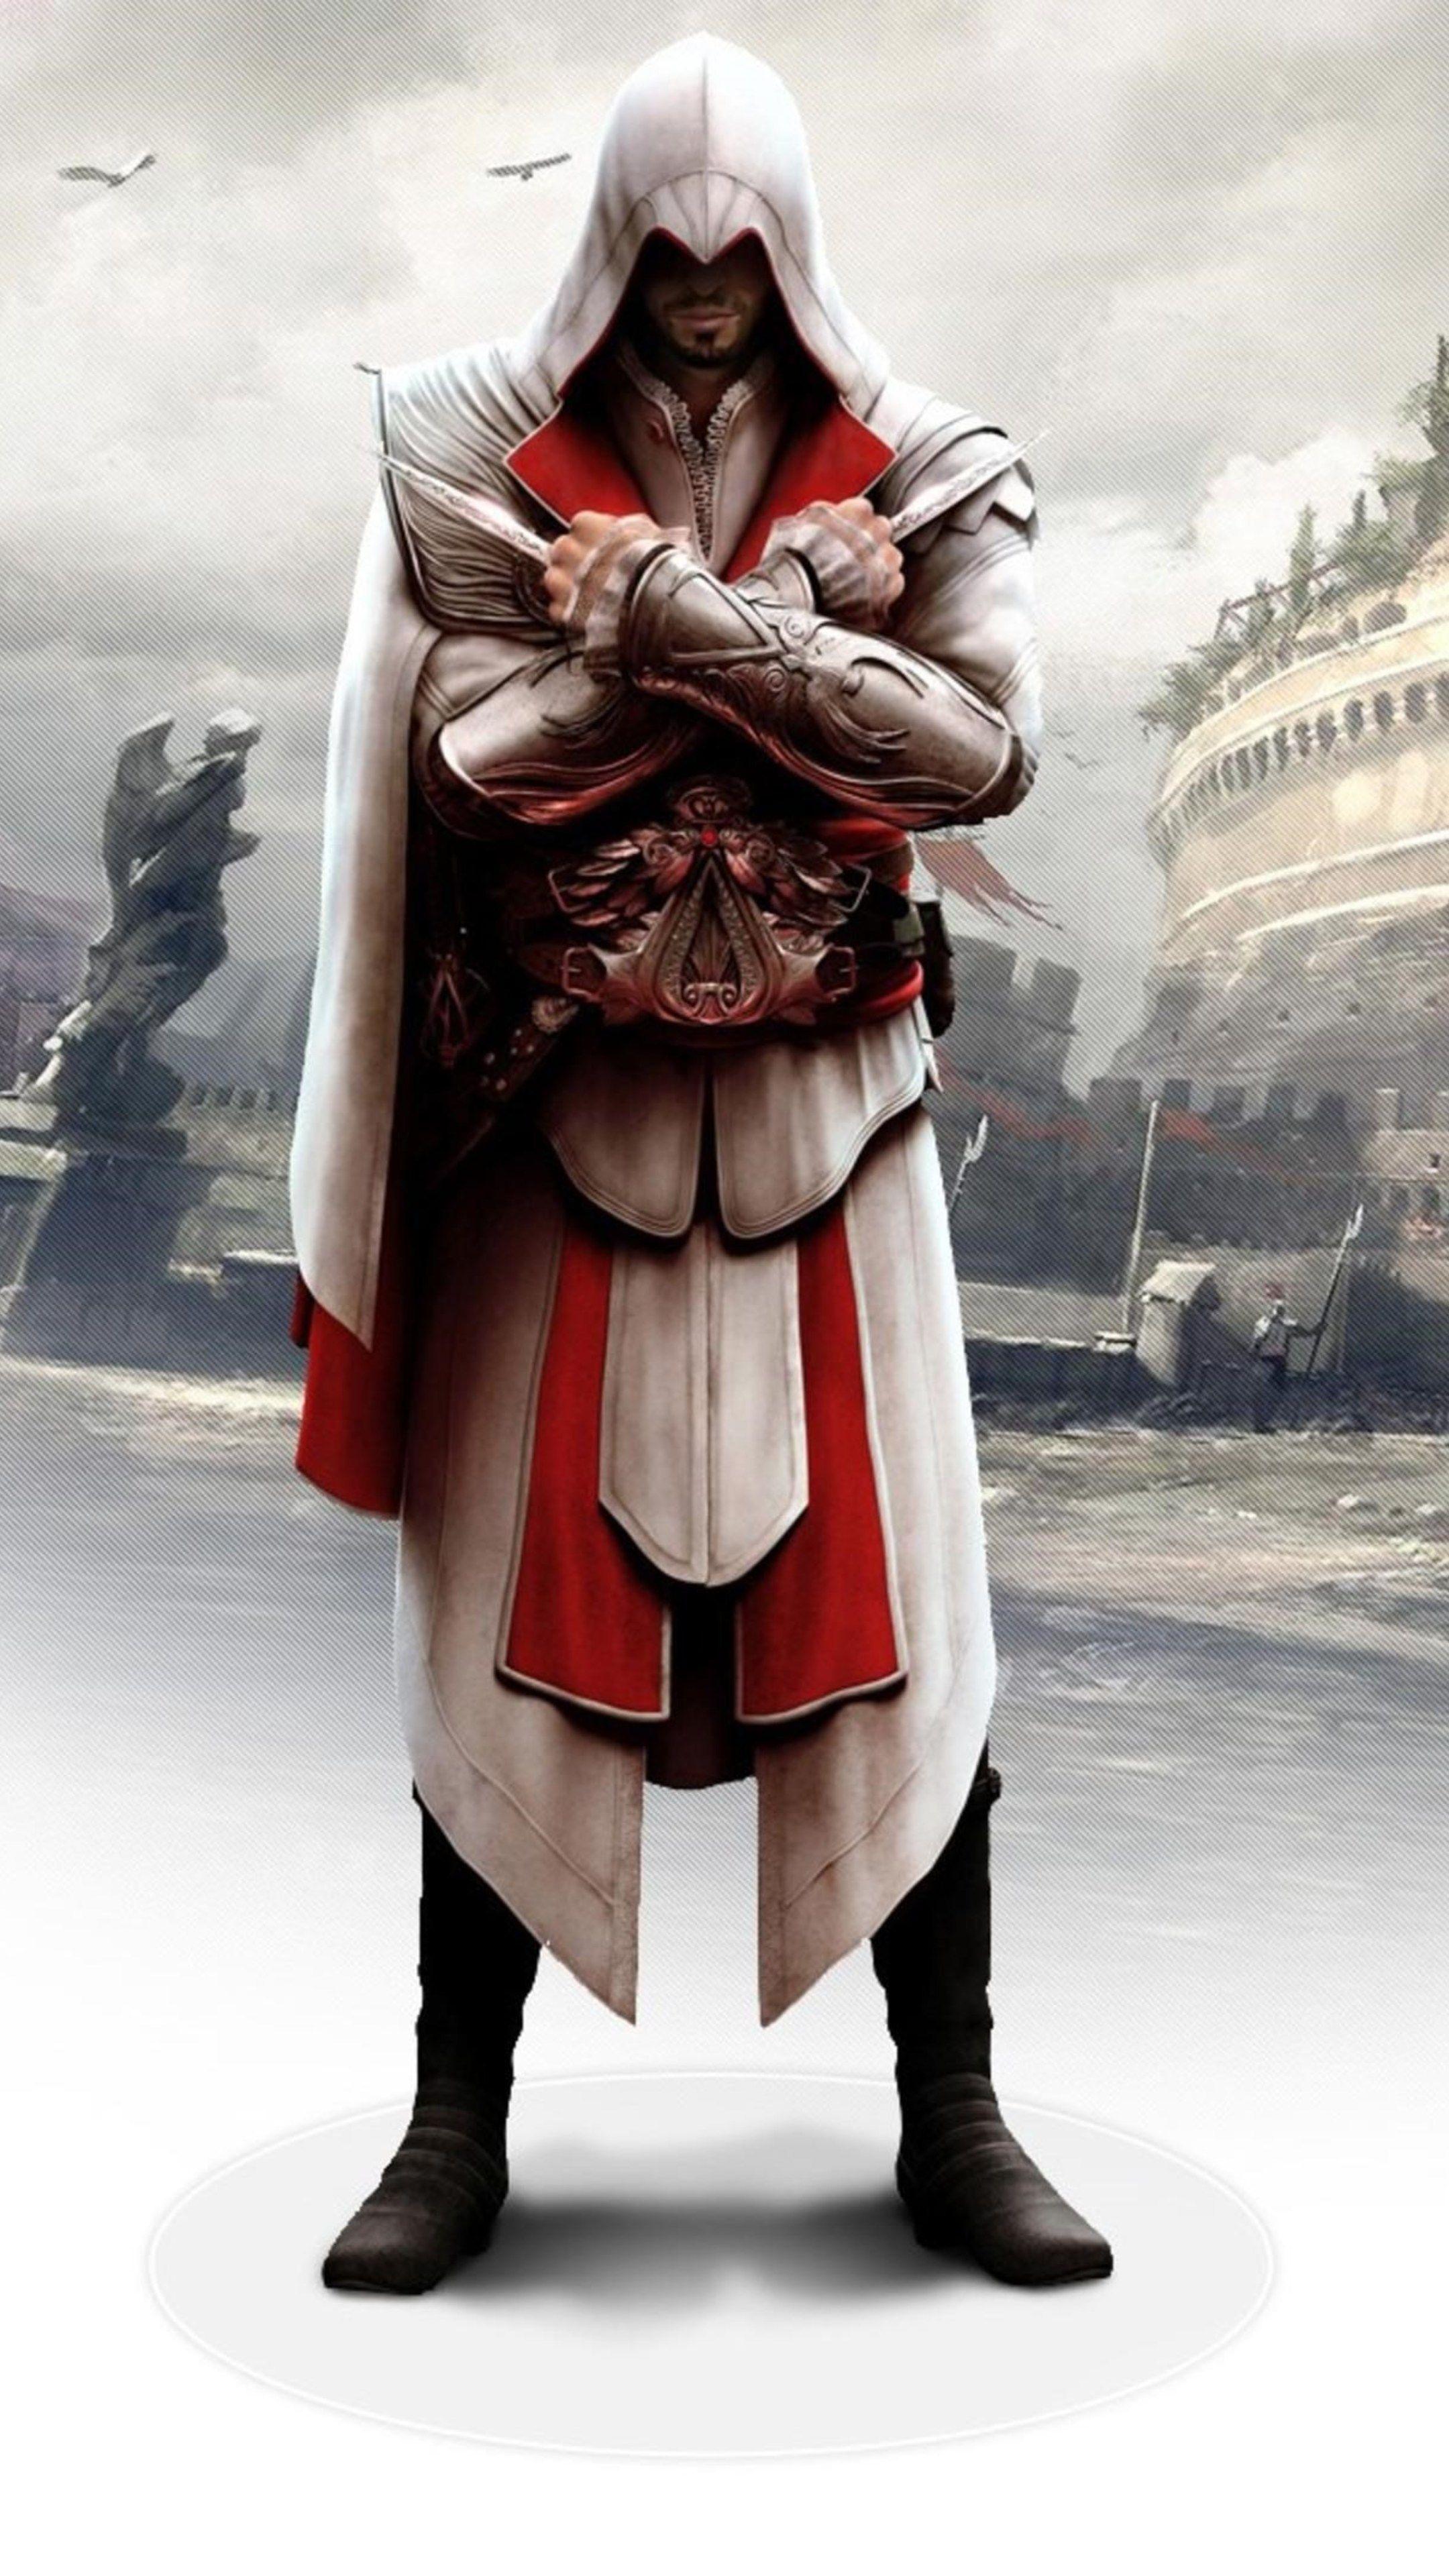 Misc Ezio In Assassins Creed Brotherhood Wallpapers Assassin S